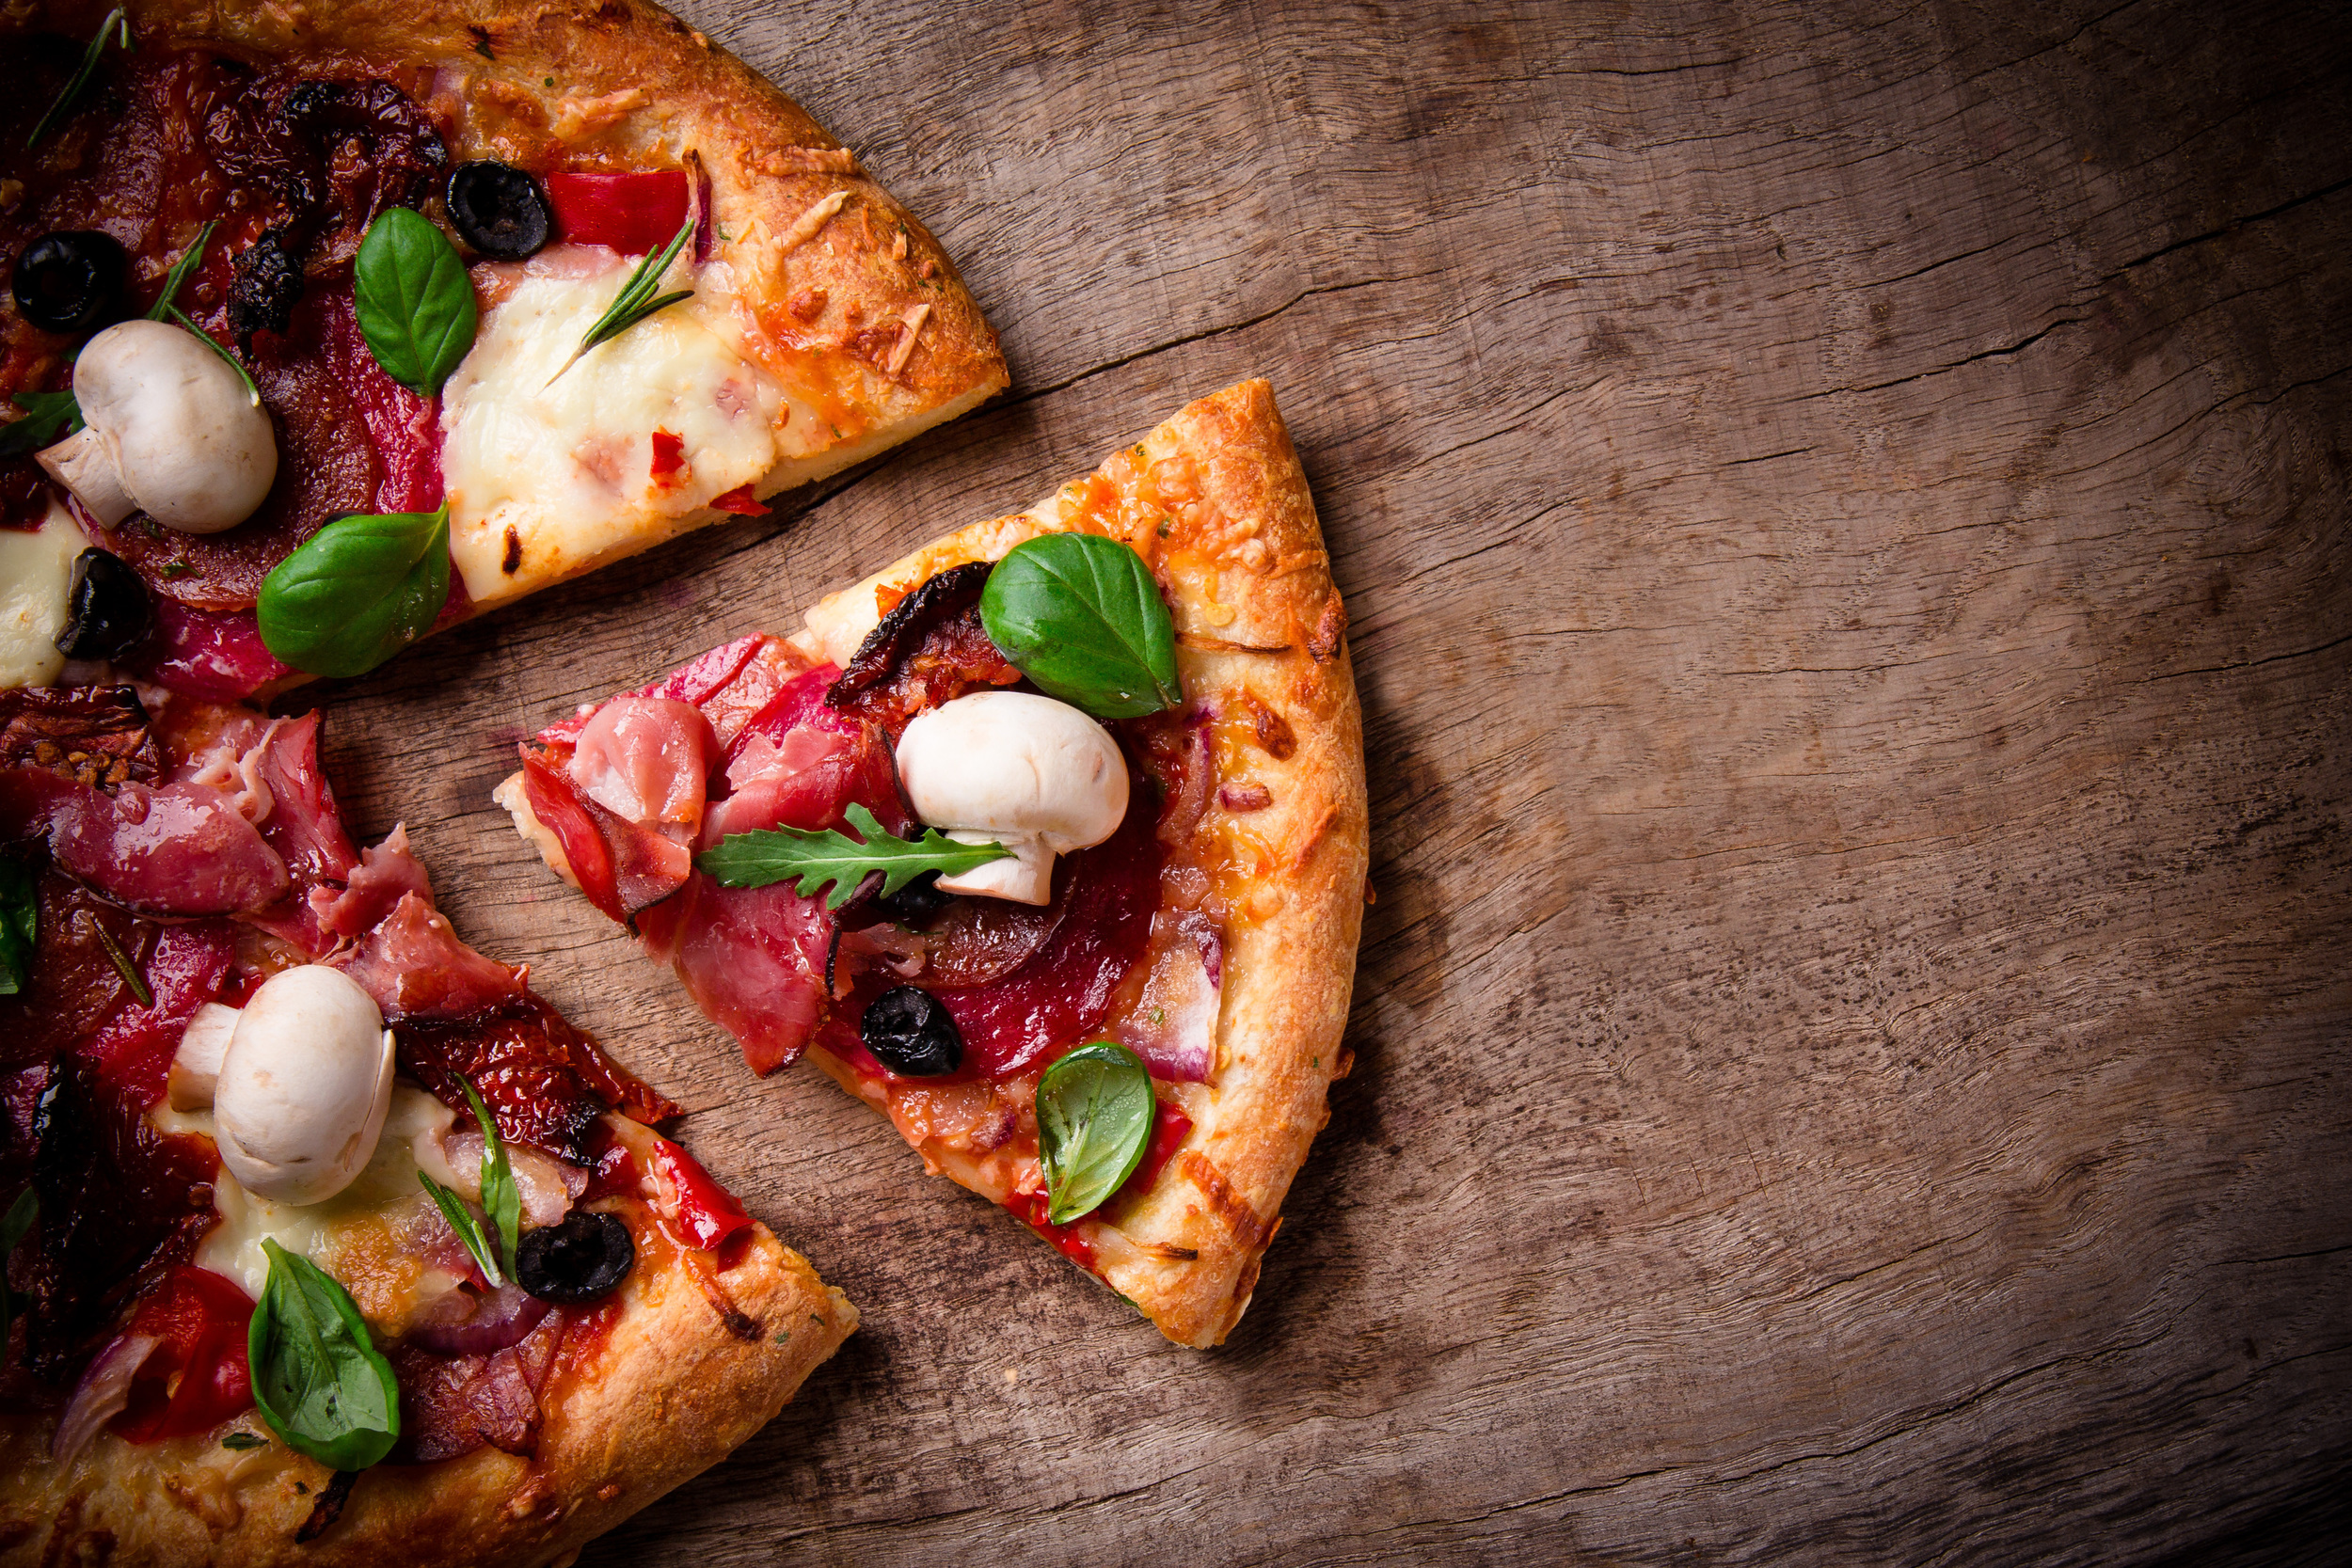 Classic Italian-American Cuisine   ITALIAN KITCHEN · BAR ·RESTAURANT   Order Online  Learn More